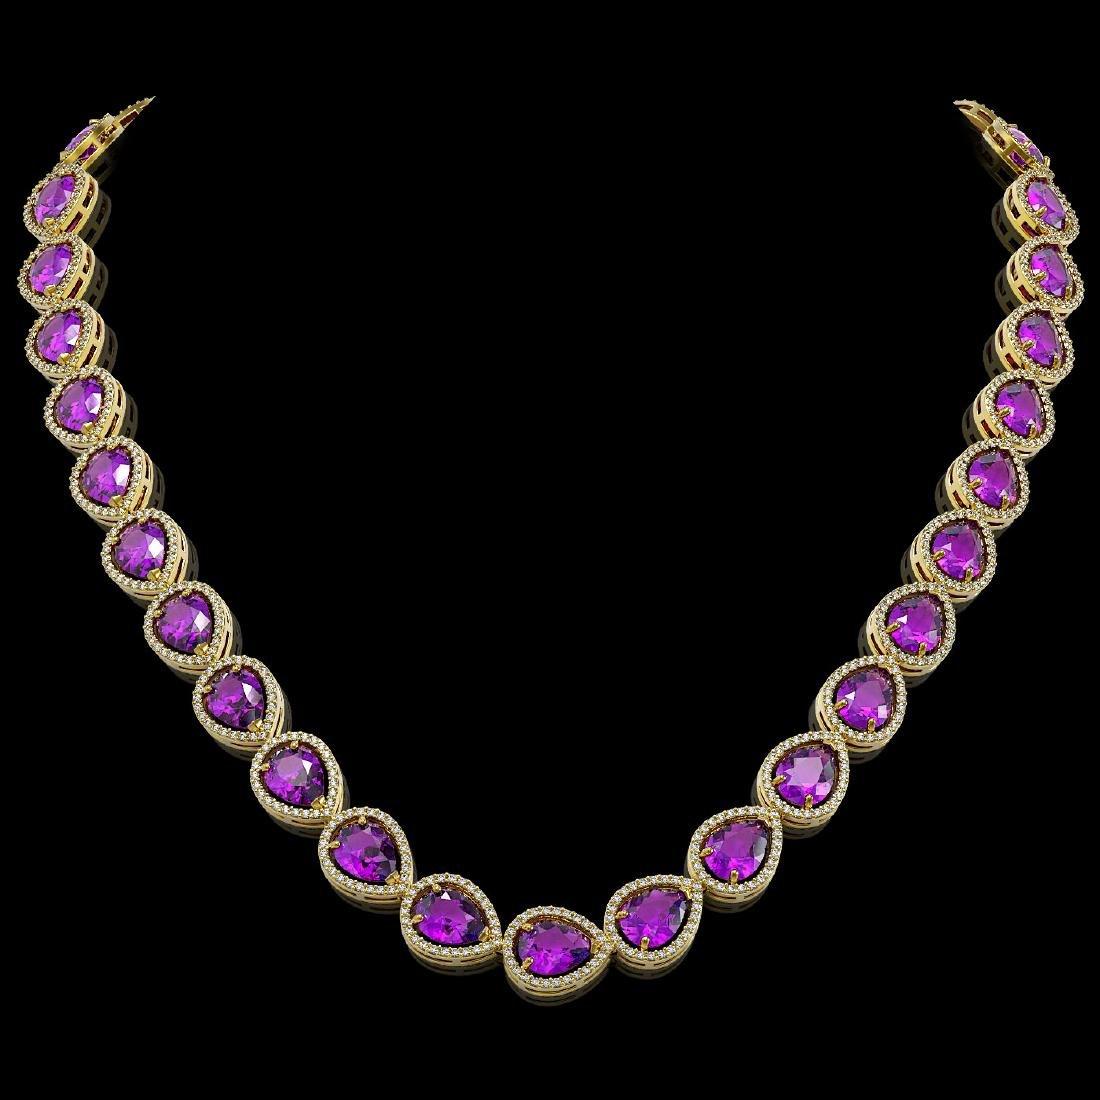 43.2 CTW Amethyst & Diamond Halo Necklace 10K Yellow